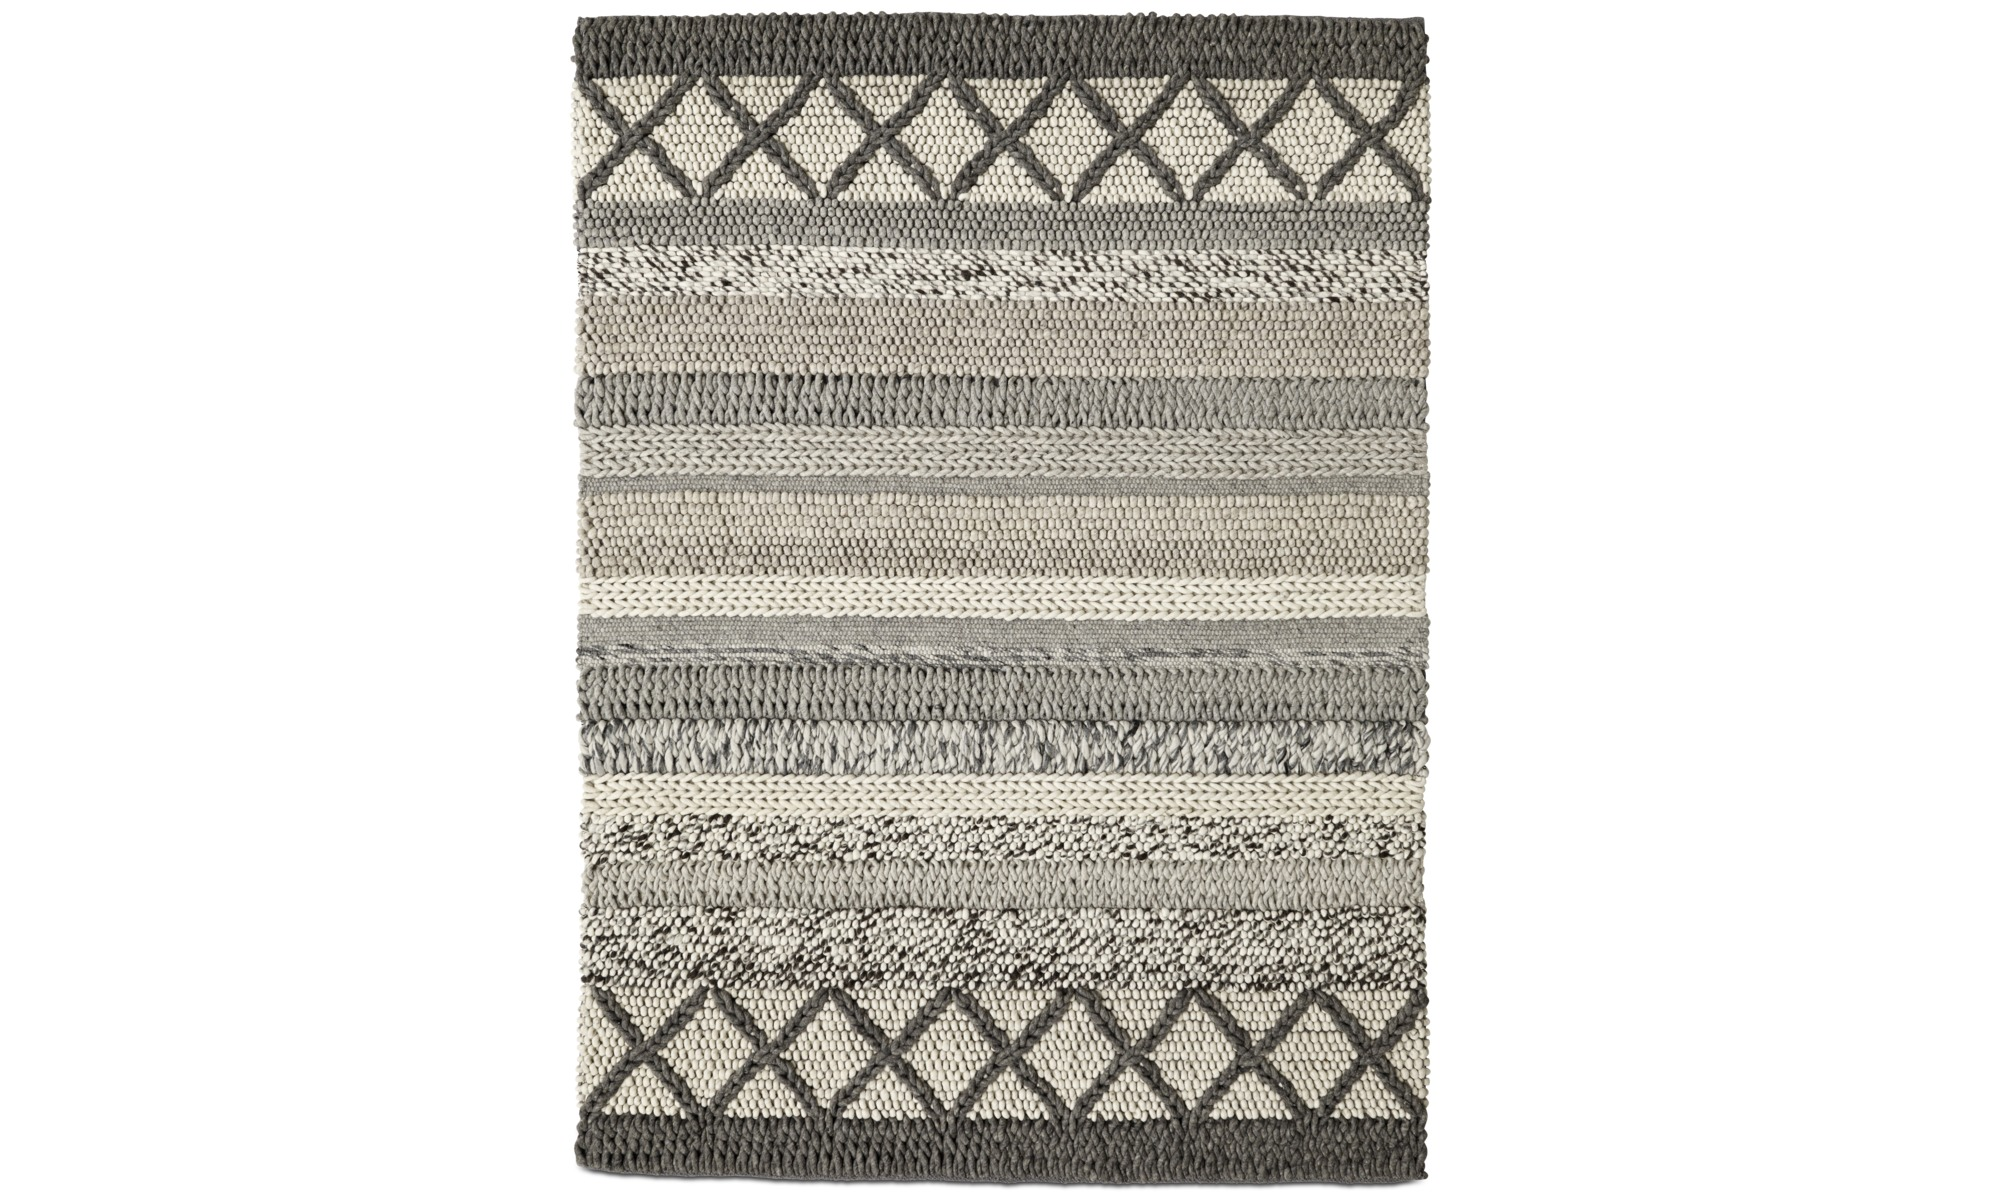 Teppiche - Palencia Teppich - rechteckig - Grau - Stoff